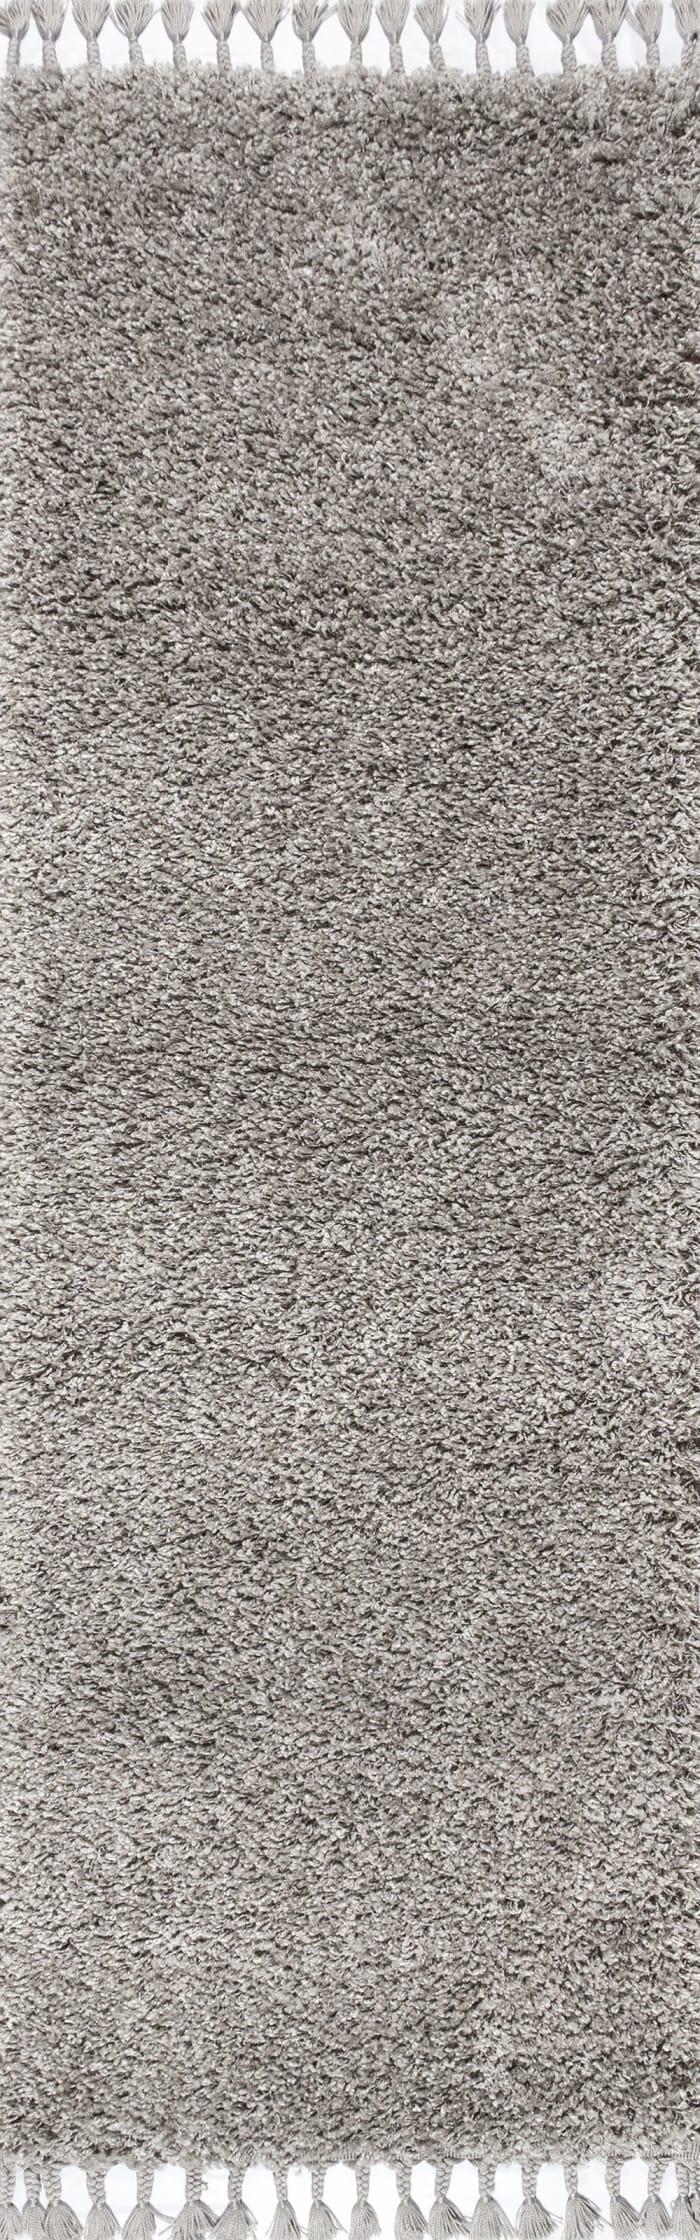 Shag Plush Tassel Grey 2.25' x 8' Runner Rug